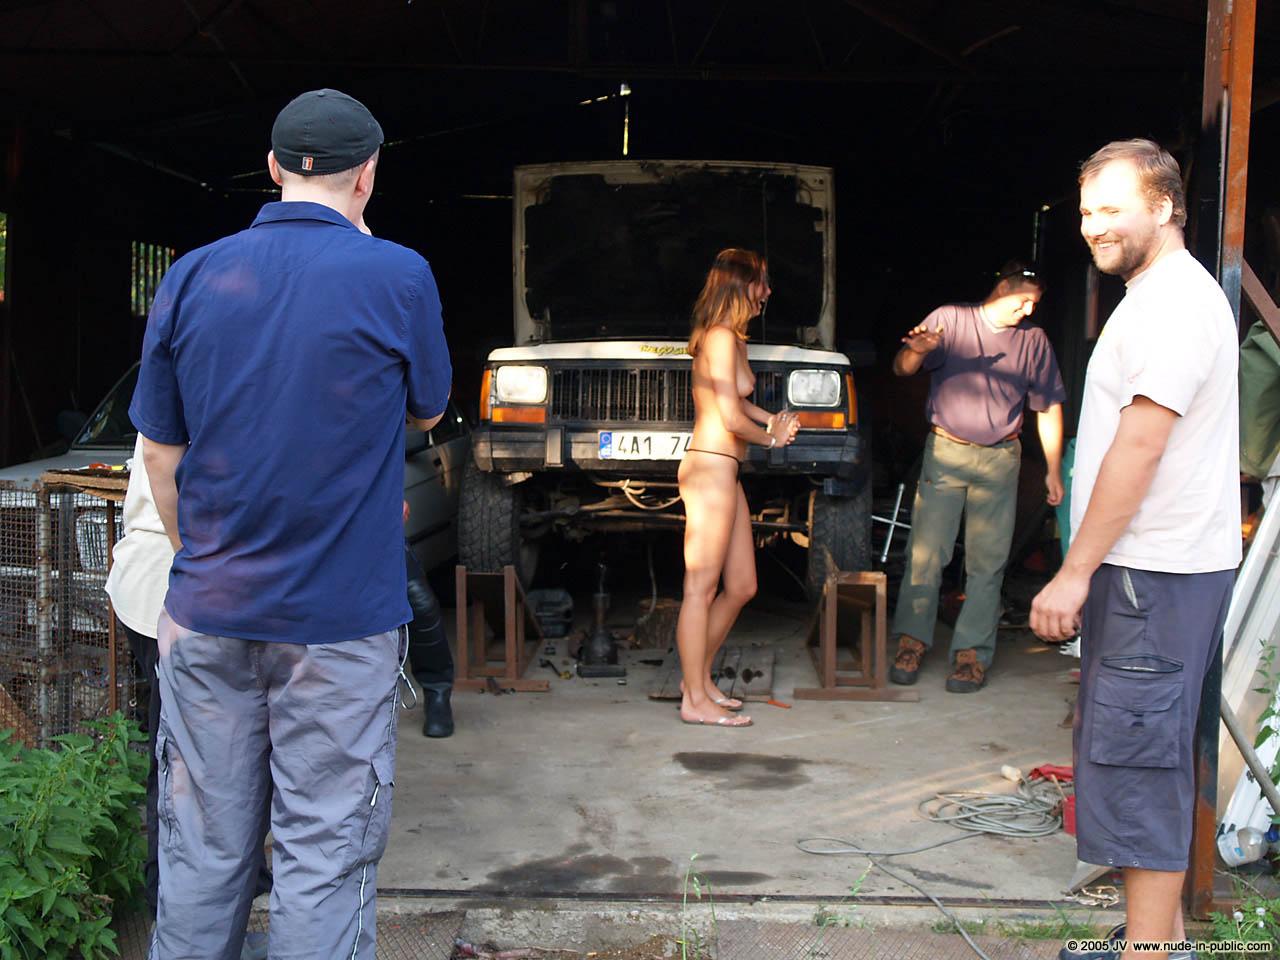 veronika-e-junkyard-cars-mechanic-nude-in-public-08